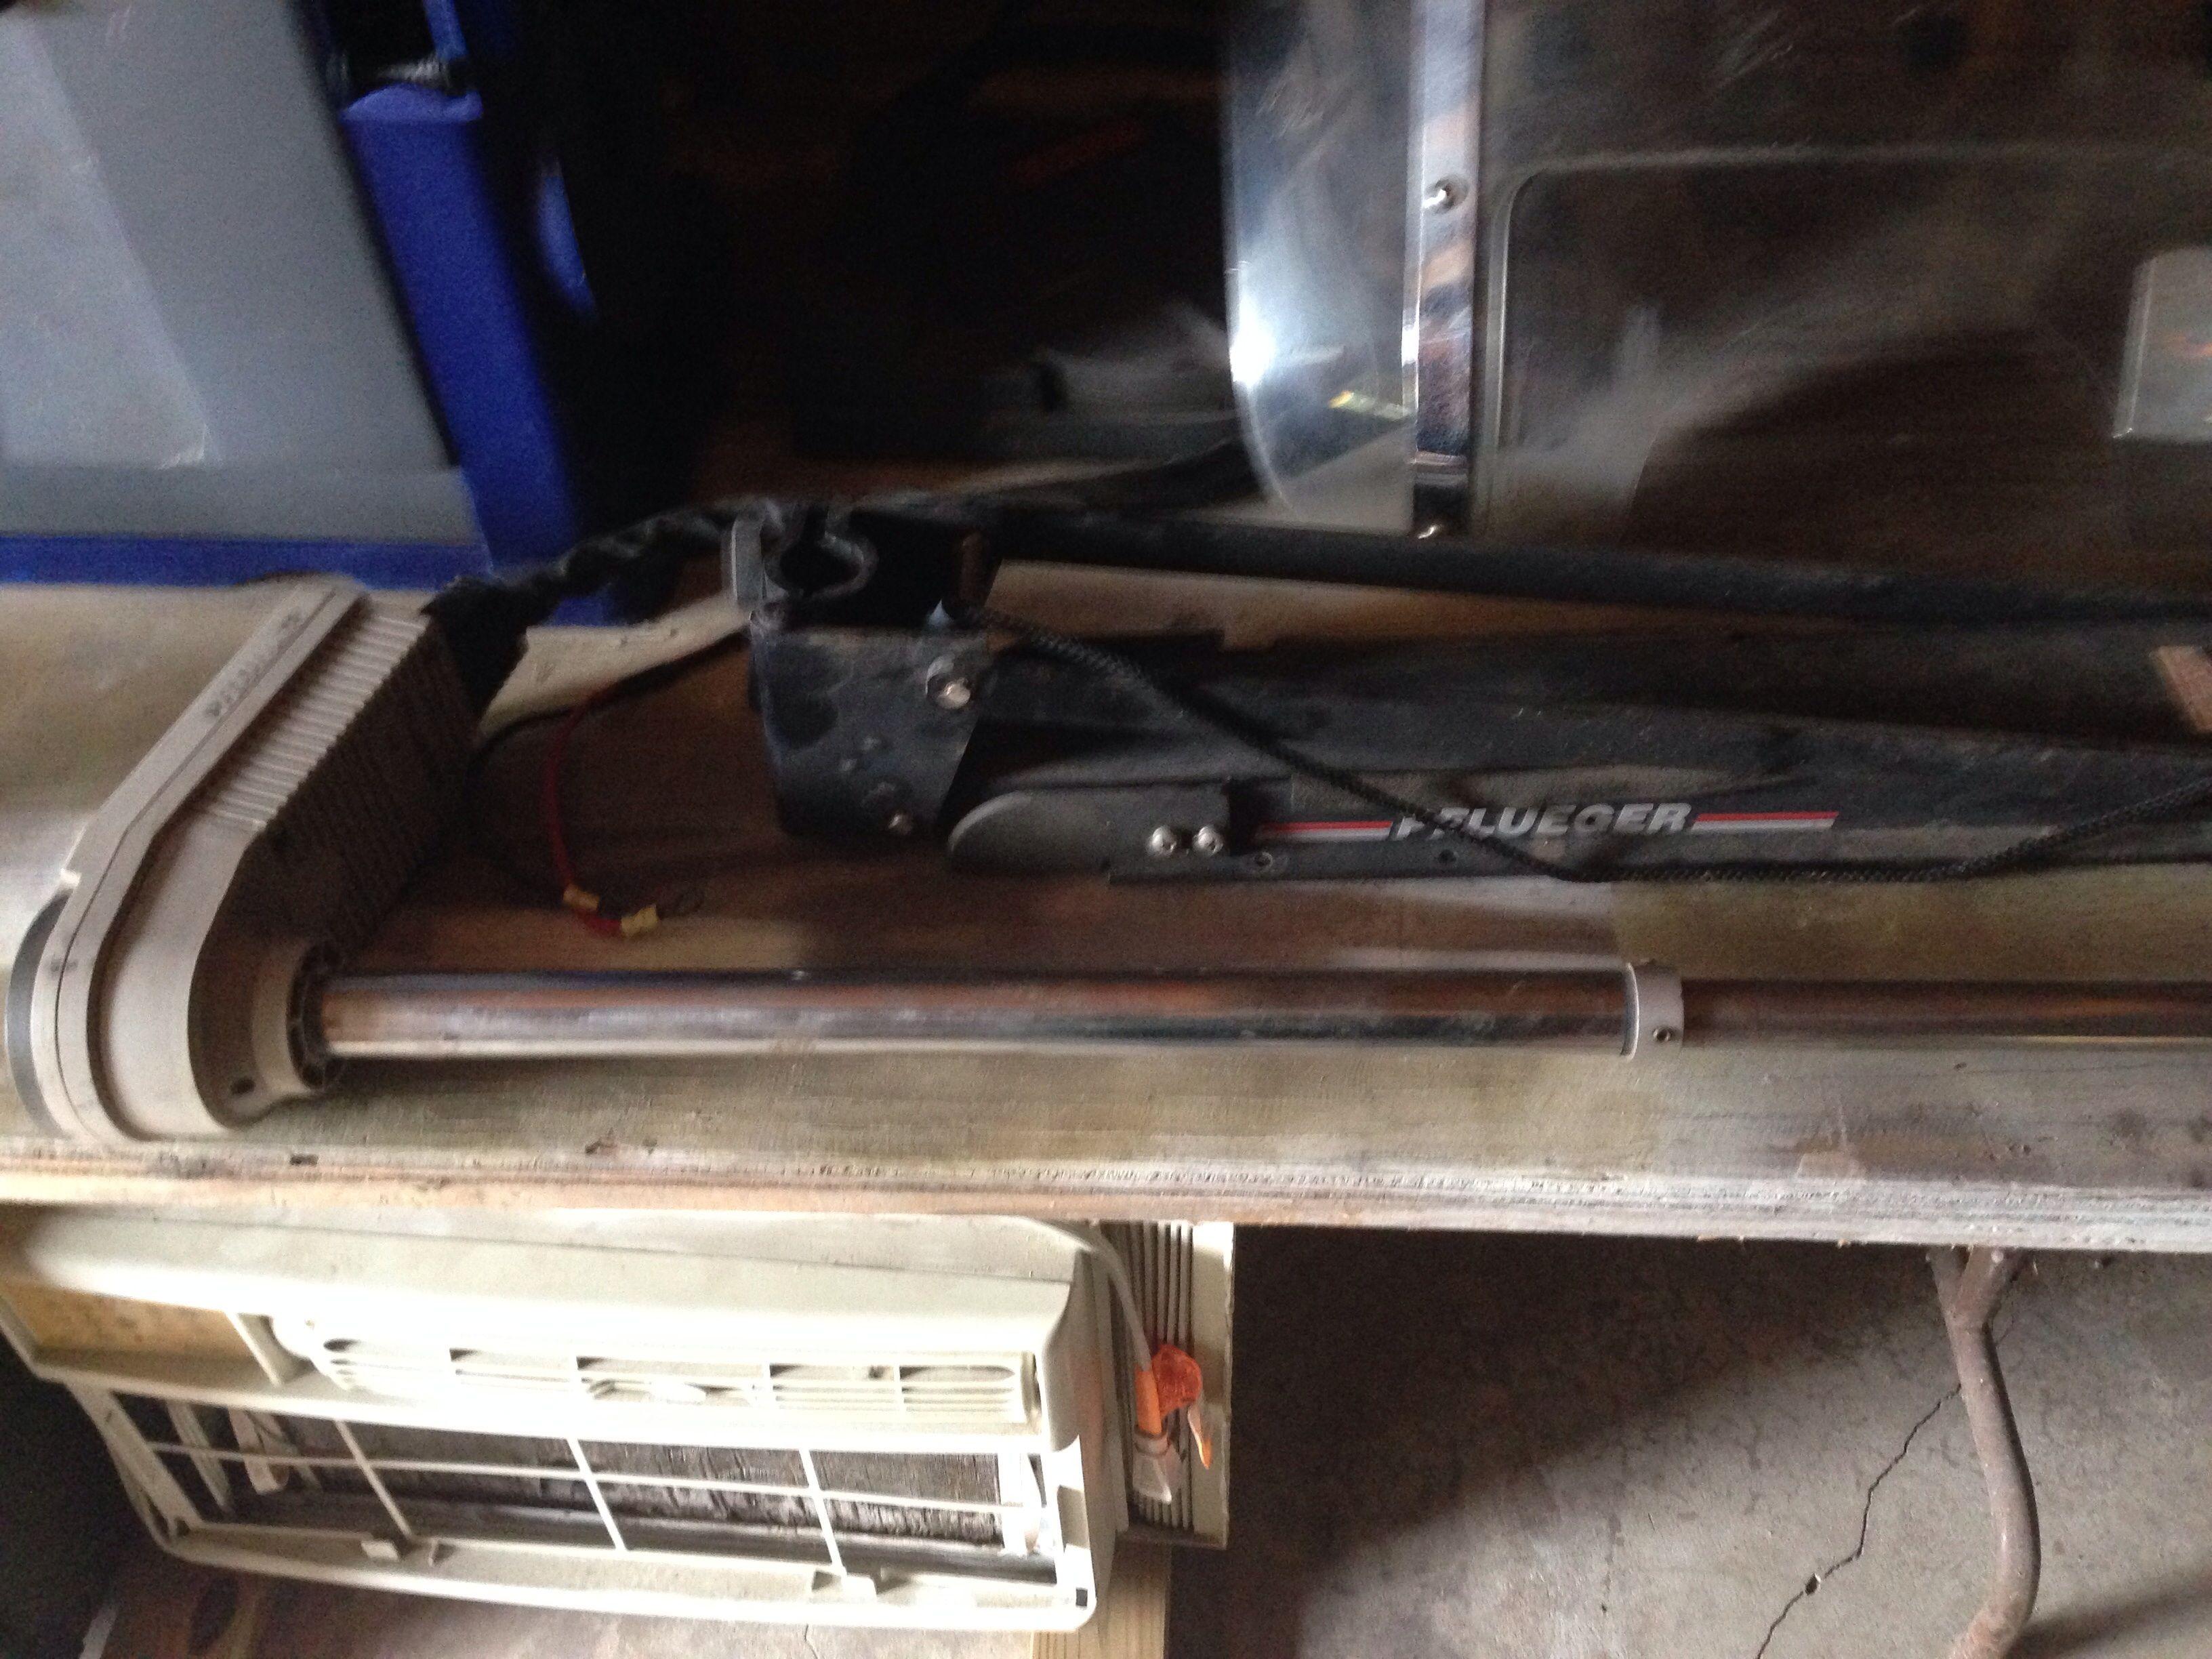 Pflueger Trolling Motor In Save S Garage Sale San Antonio Tx